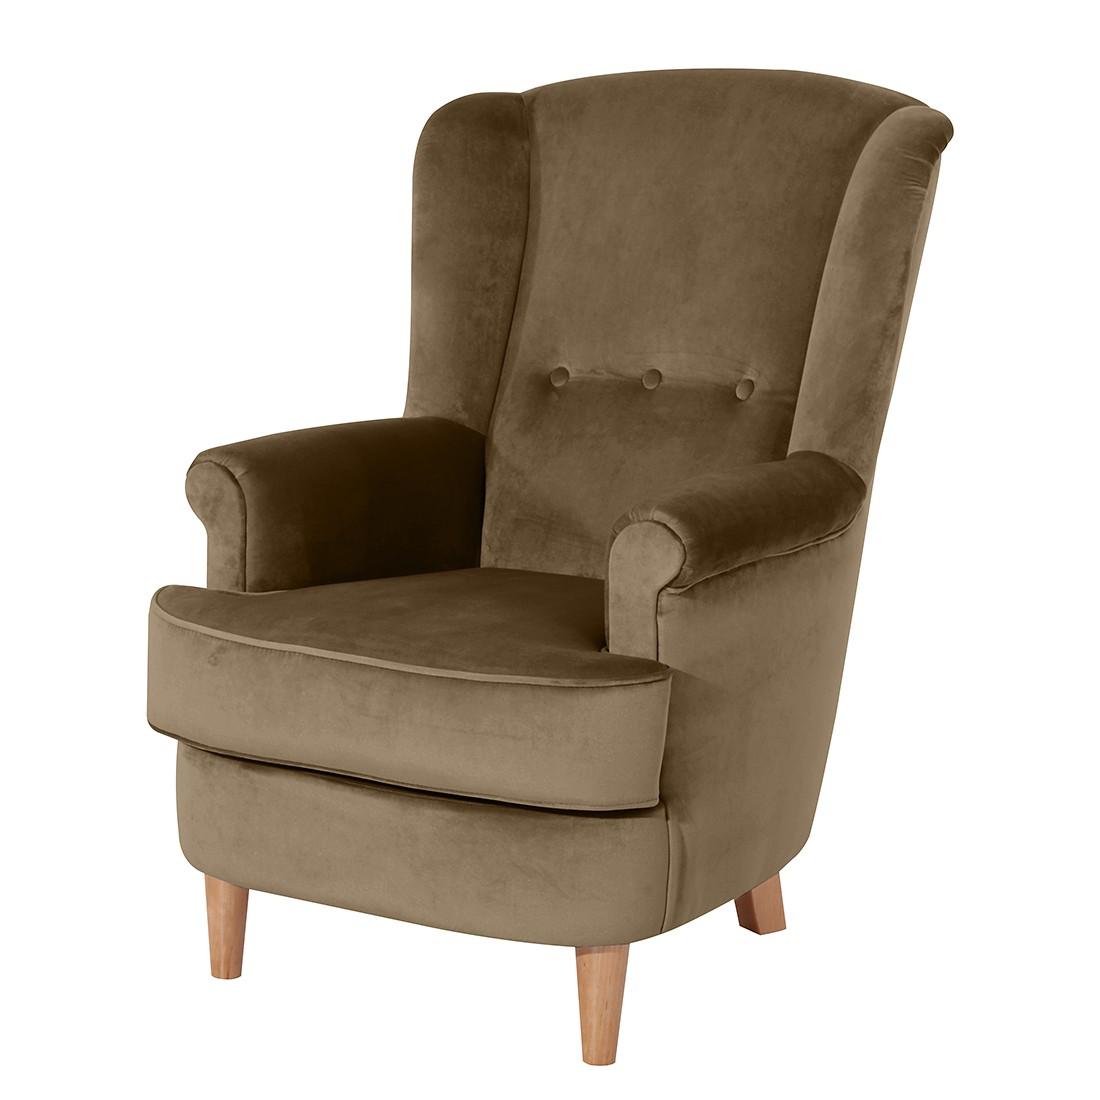 max winzer ohrensessel orthez samt karamell max winzer. Black Bedroom Furniture Sets. Home Design Ideas